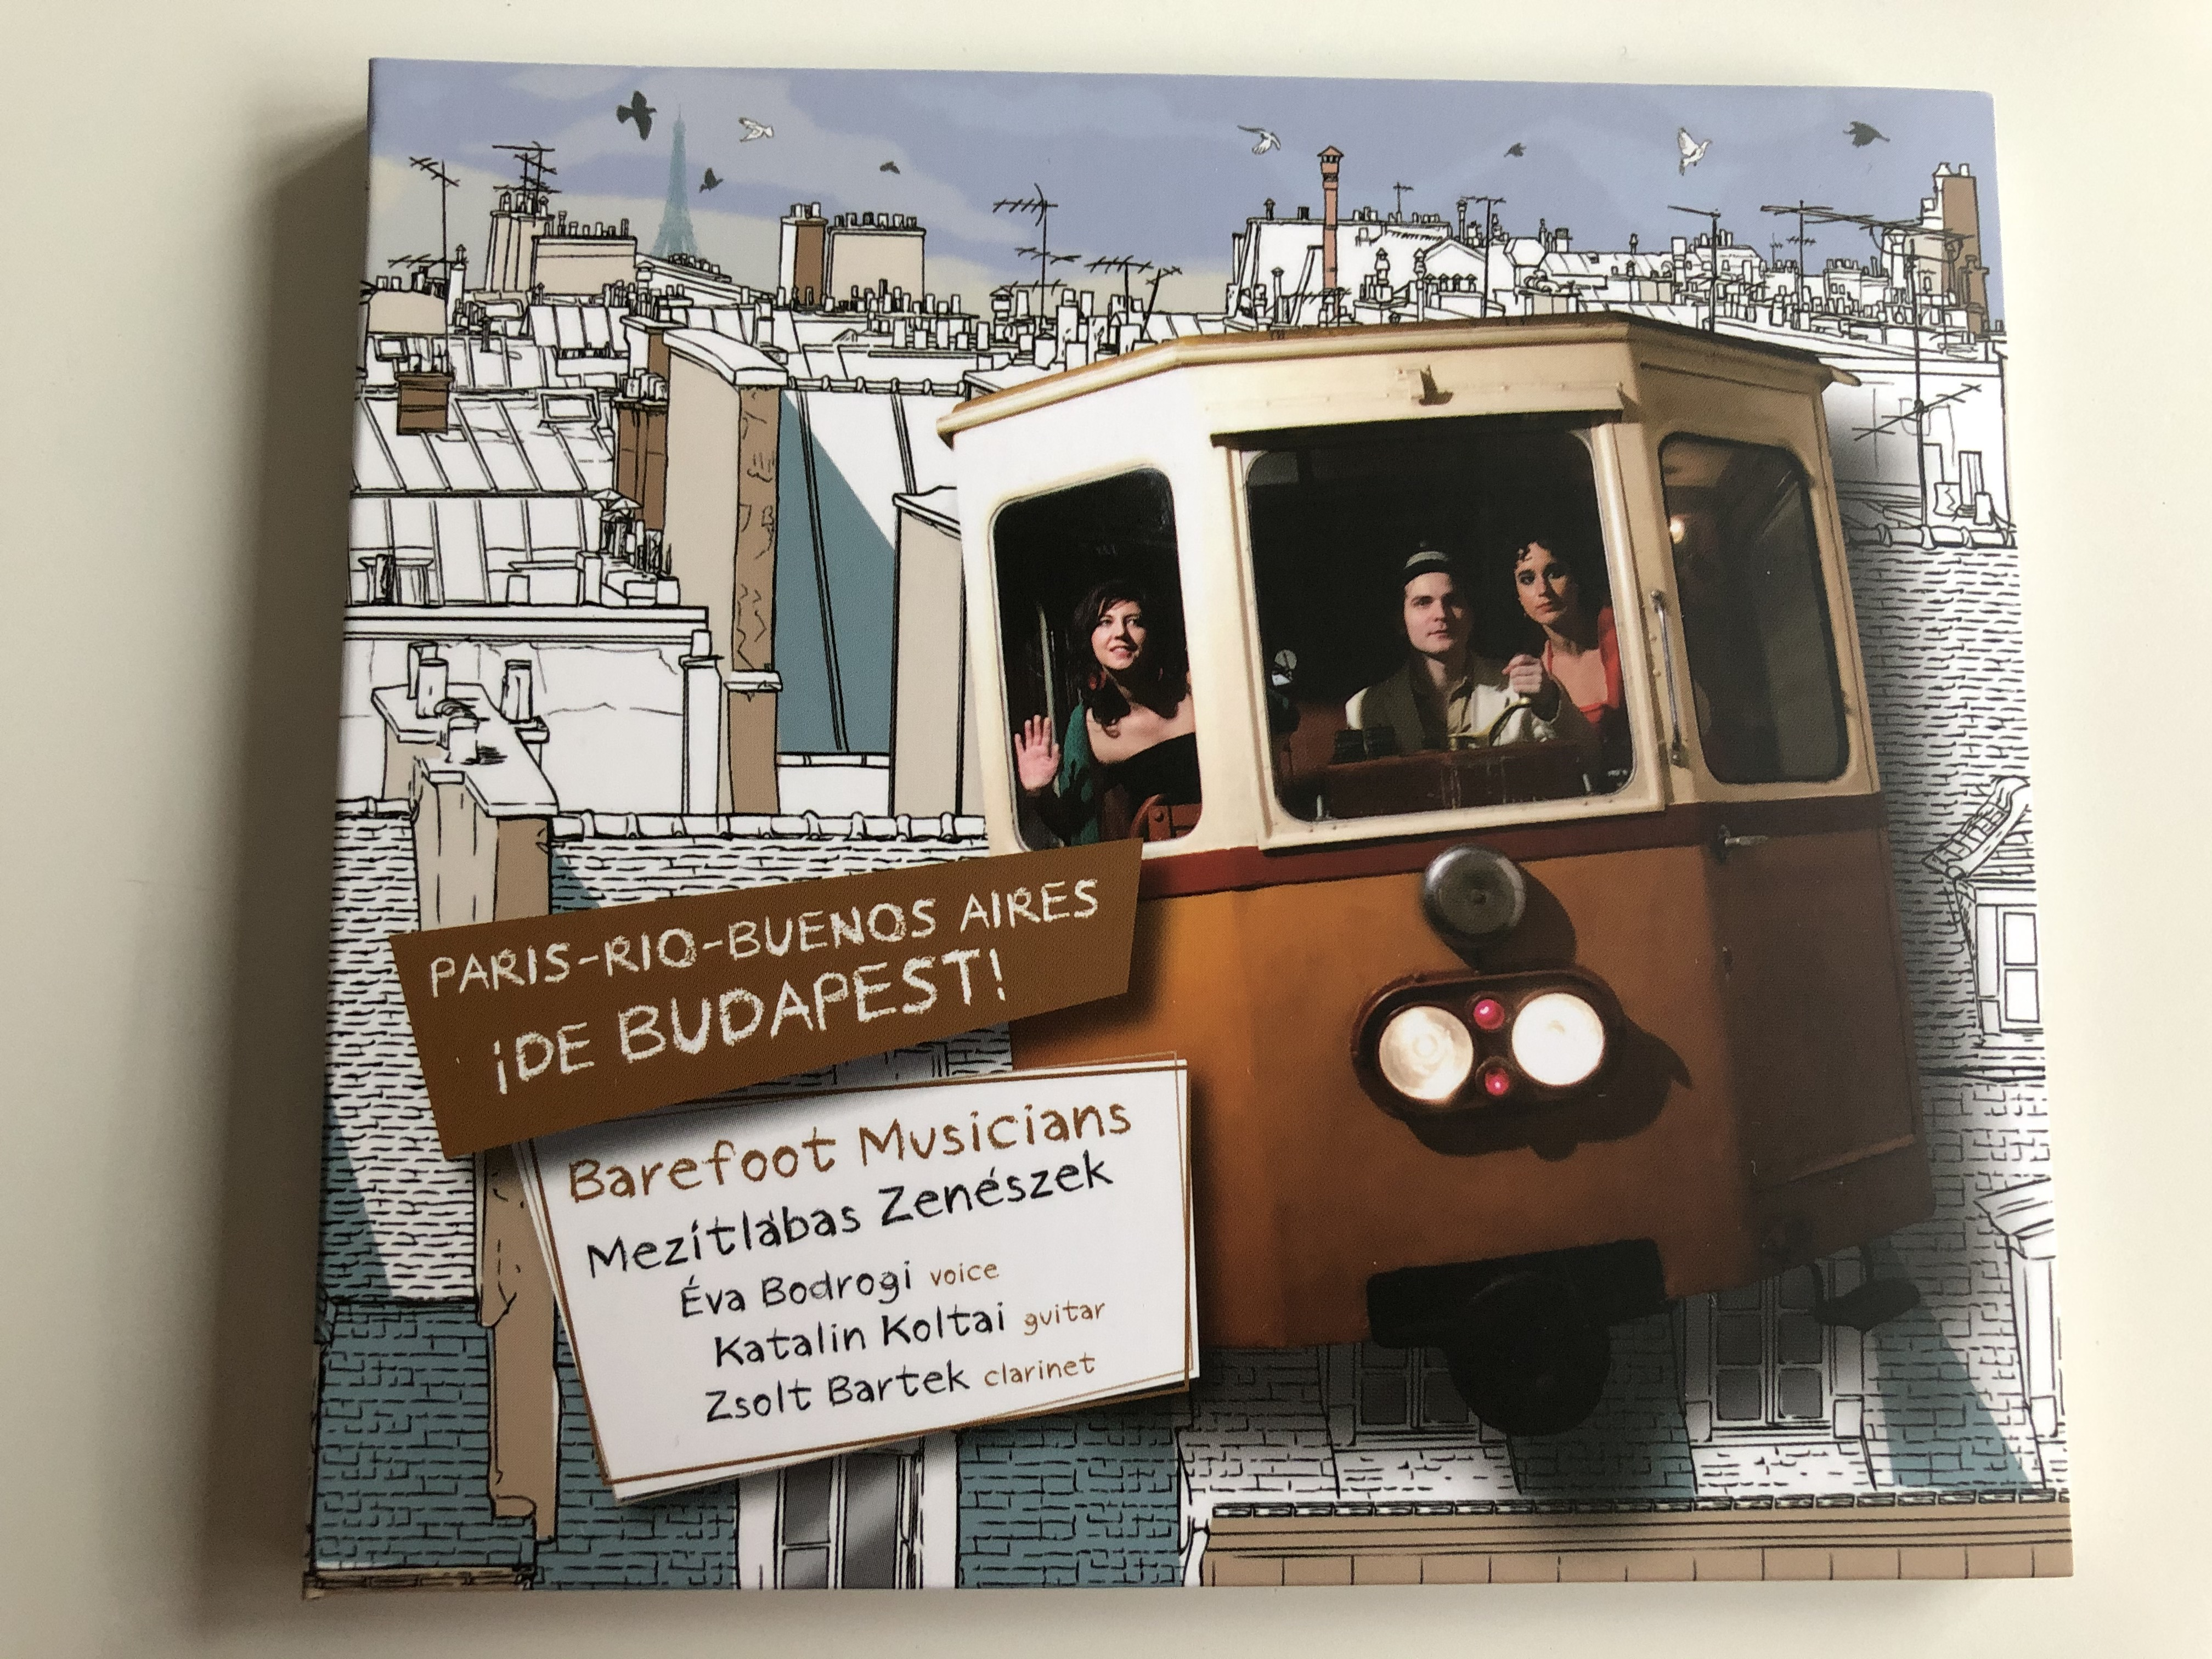 paris-rio-buenos-aires-ide-budapest-barefoot-musicians-mezitlabas-zeneszek-eva-bodrogi-voice-katalin-koltai-guitar-zsolt-bartek-clarinet-gryllus-audio-cd-hcd-119-1-.jpg